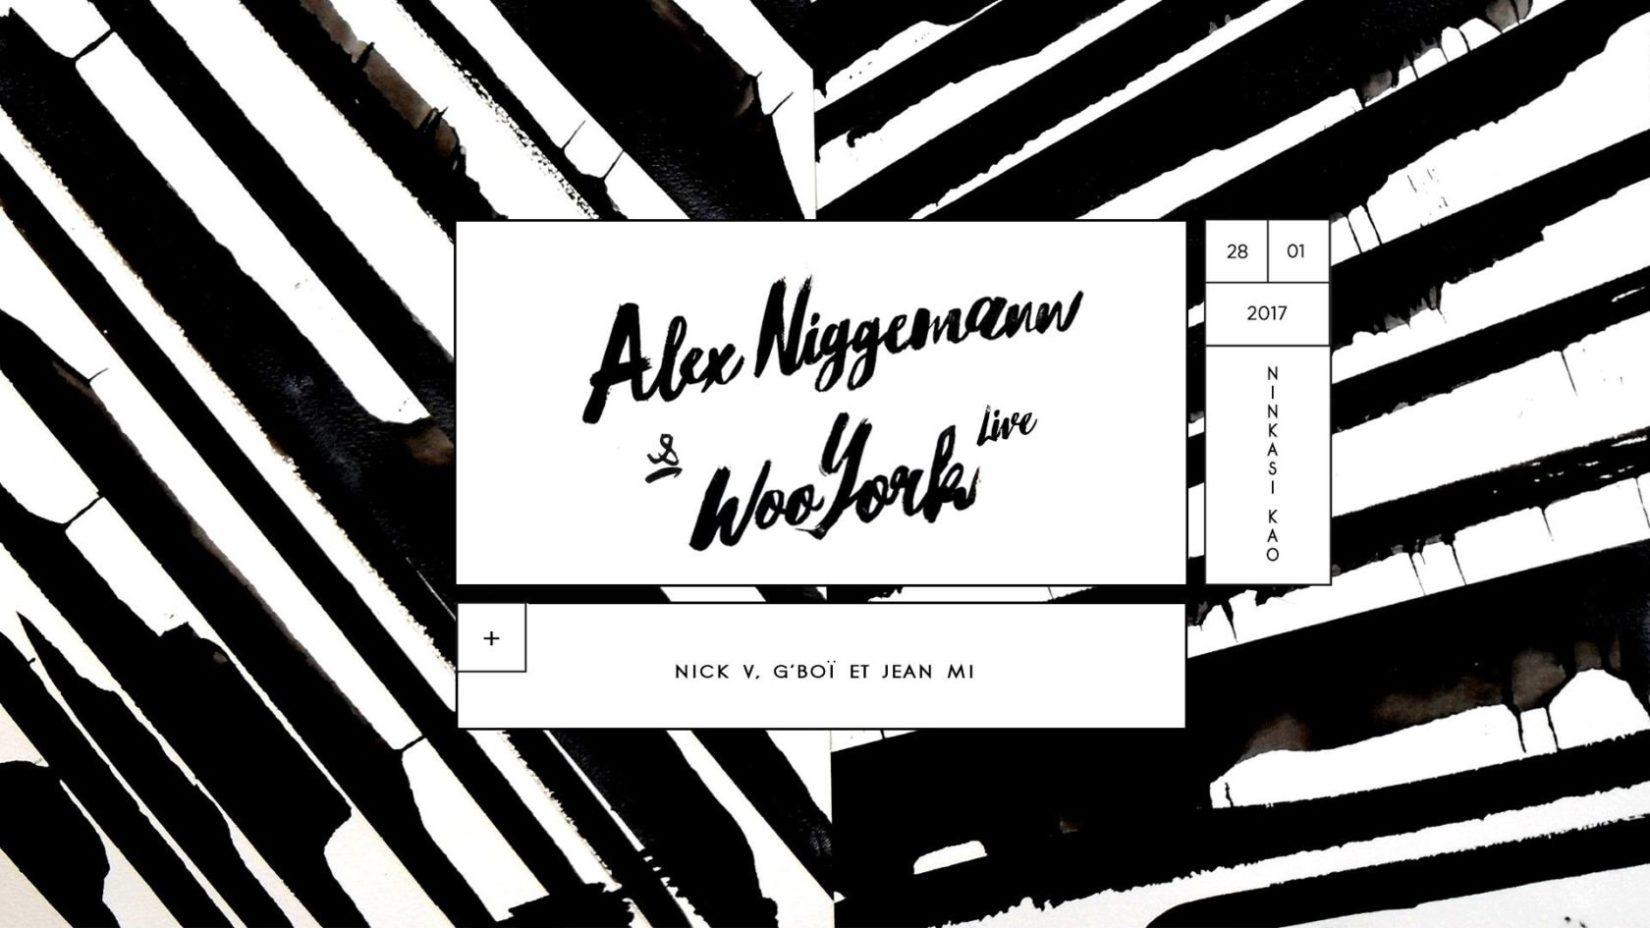 Omā avec Alex Niggemann, Woo York & Nick V